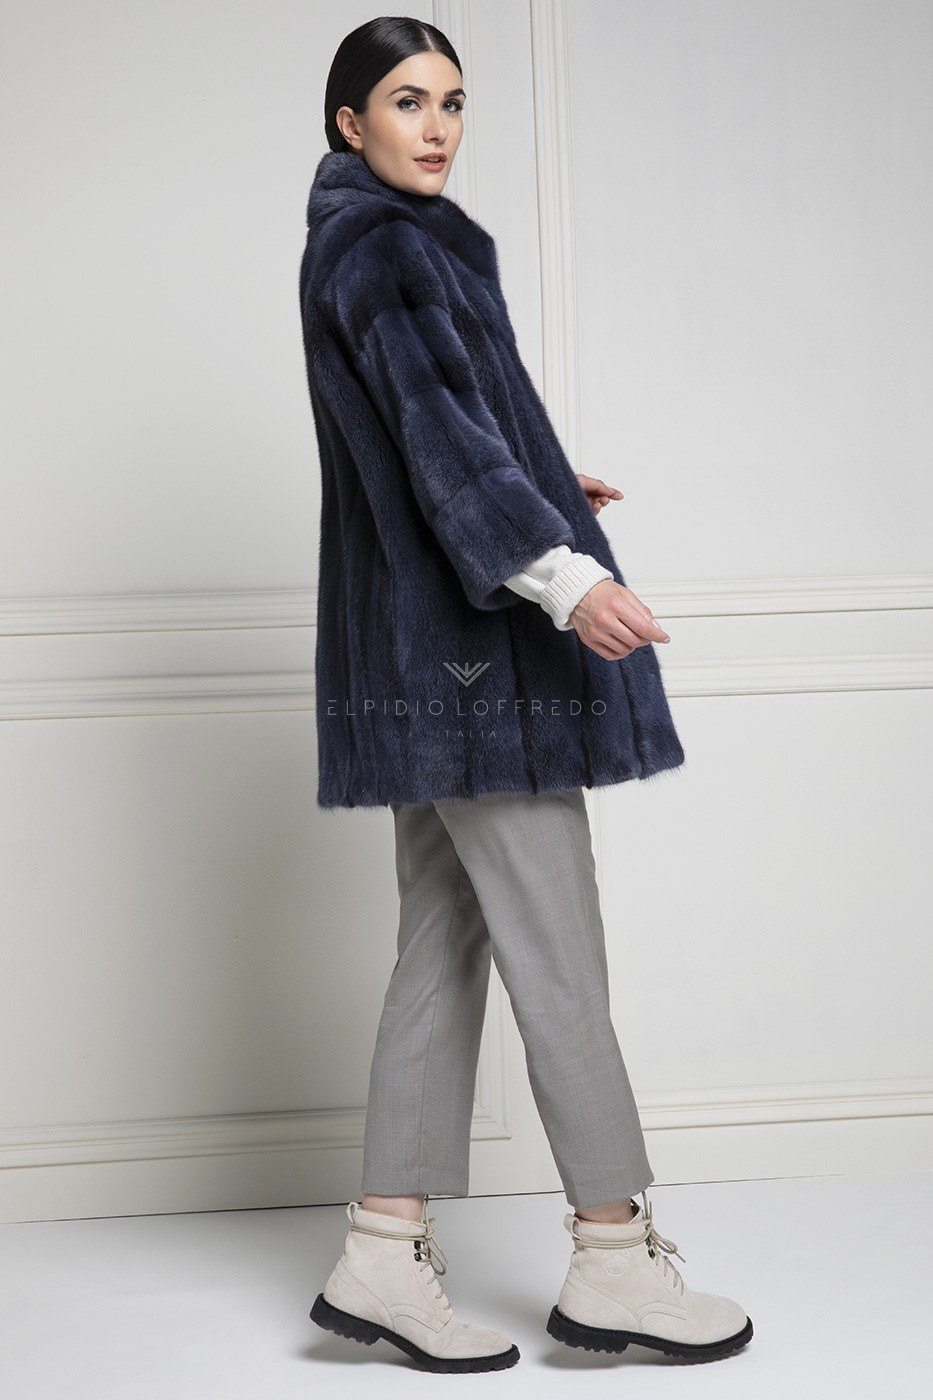 Blue Cross Female Mink Coat with whole skins - Length 80 cm